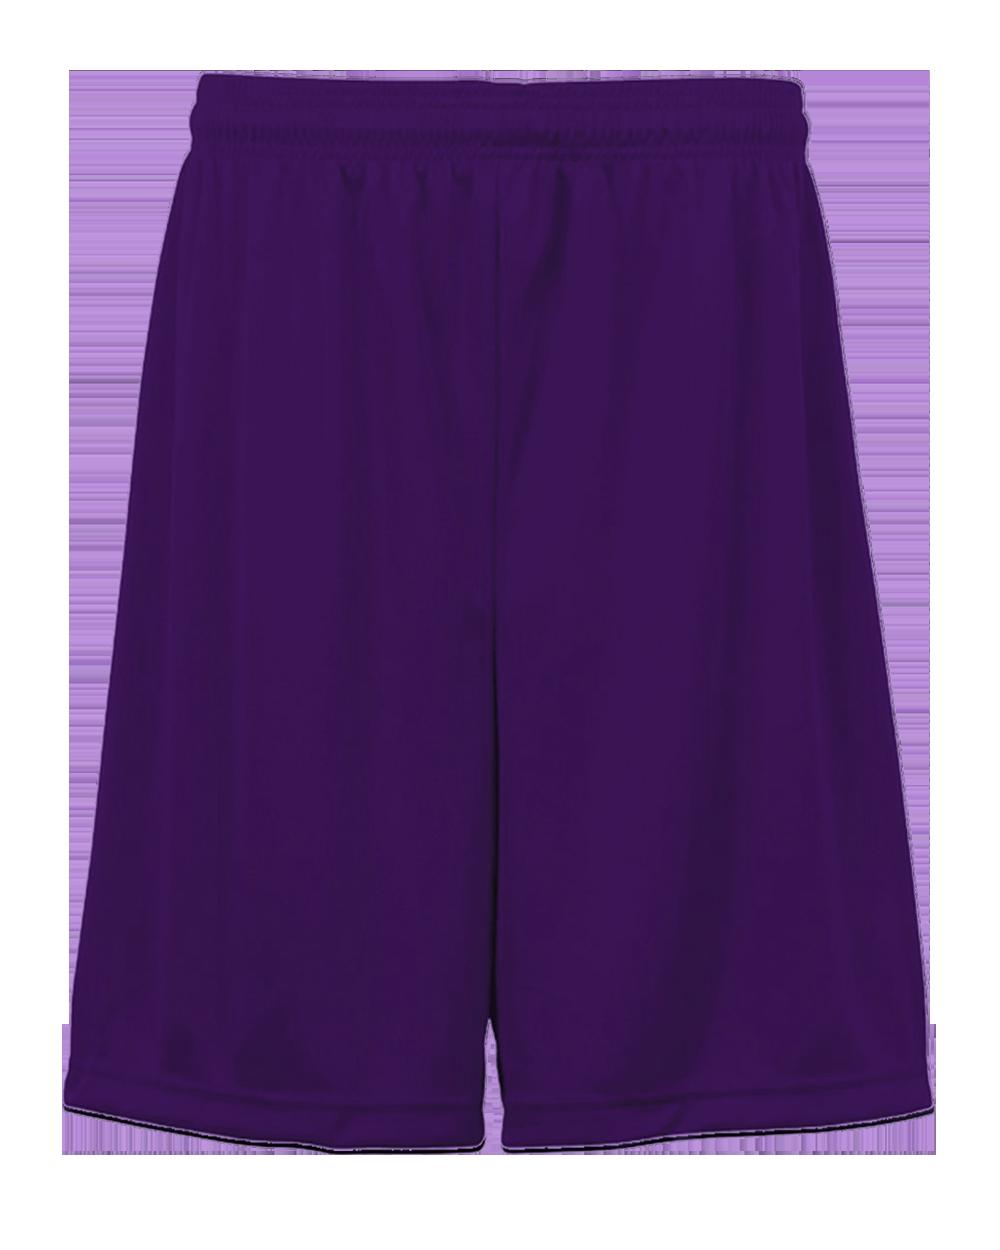 C2 Performance 7 Inch Short - Purple (005127PU)